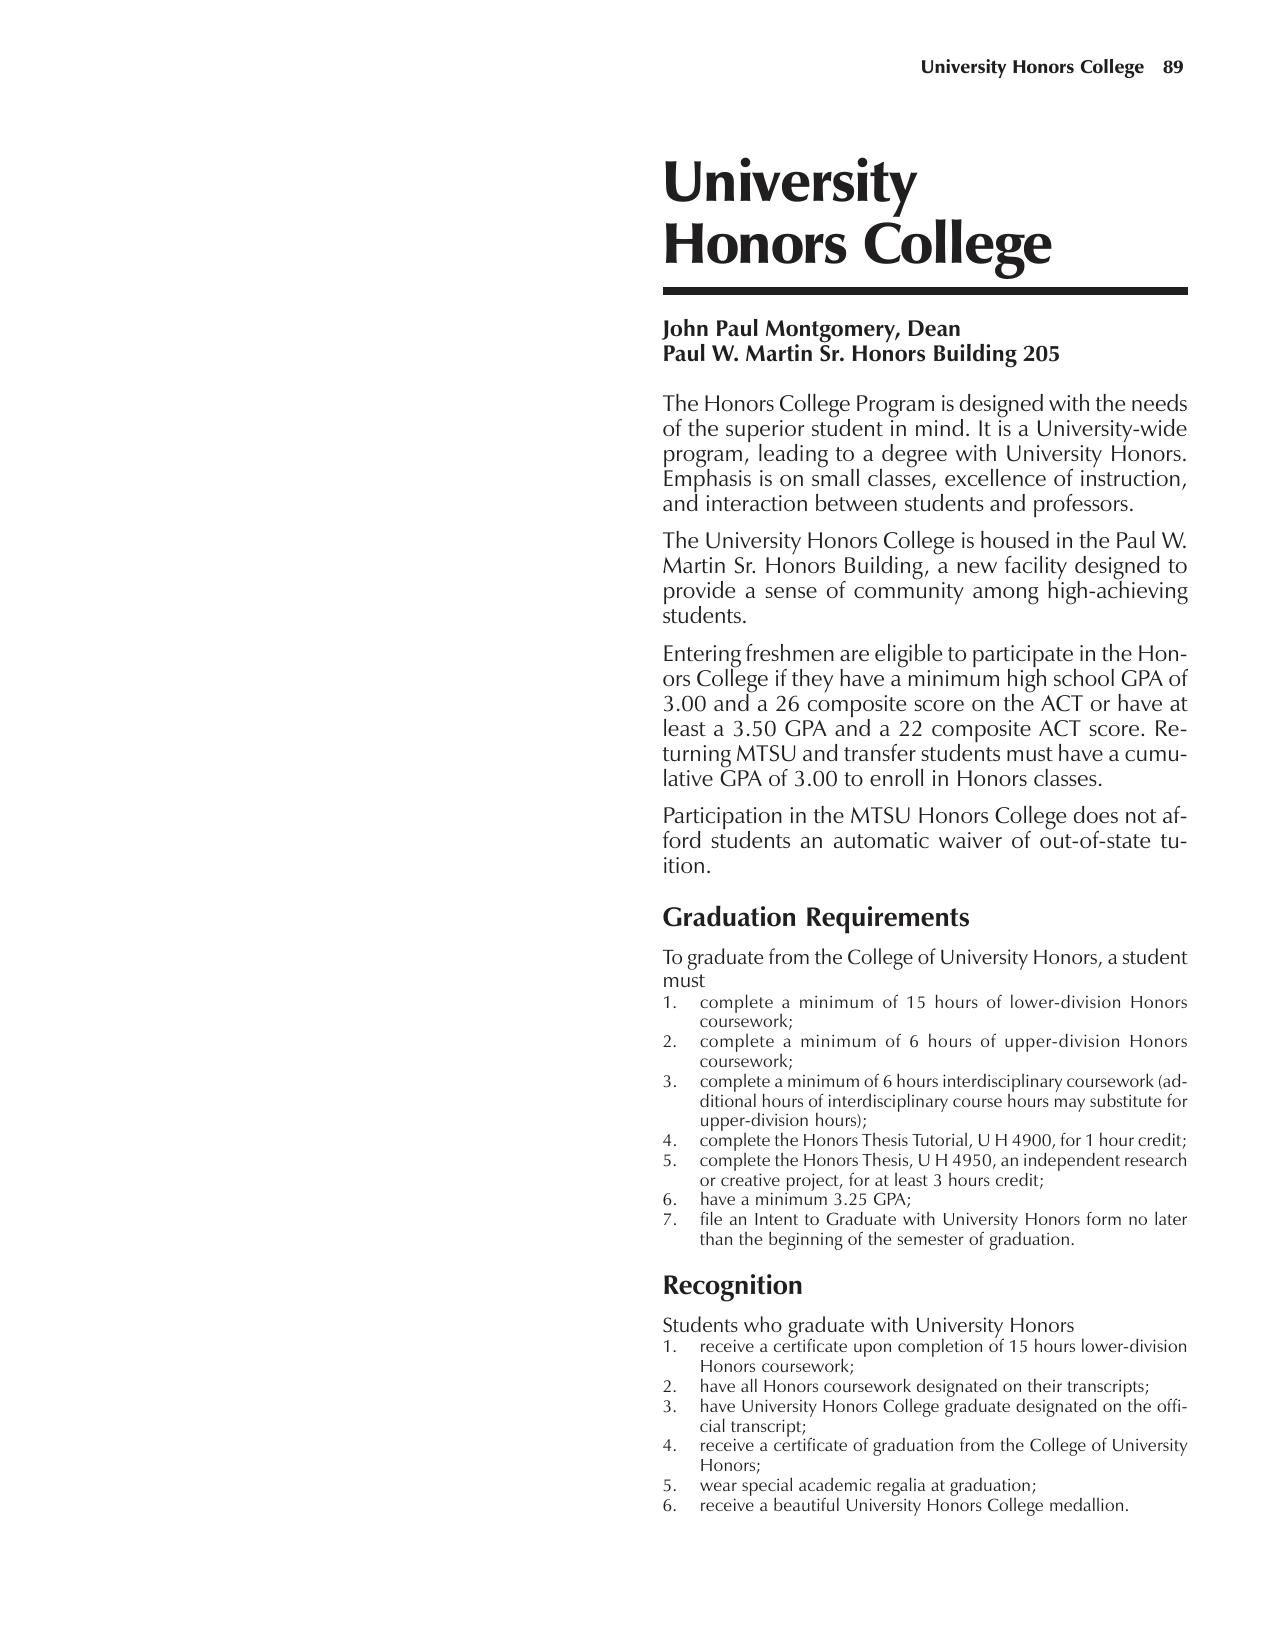 mtsu honors thesis proposal